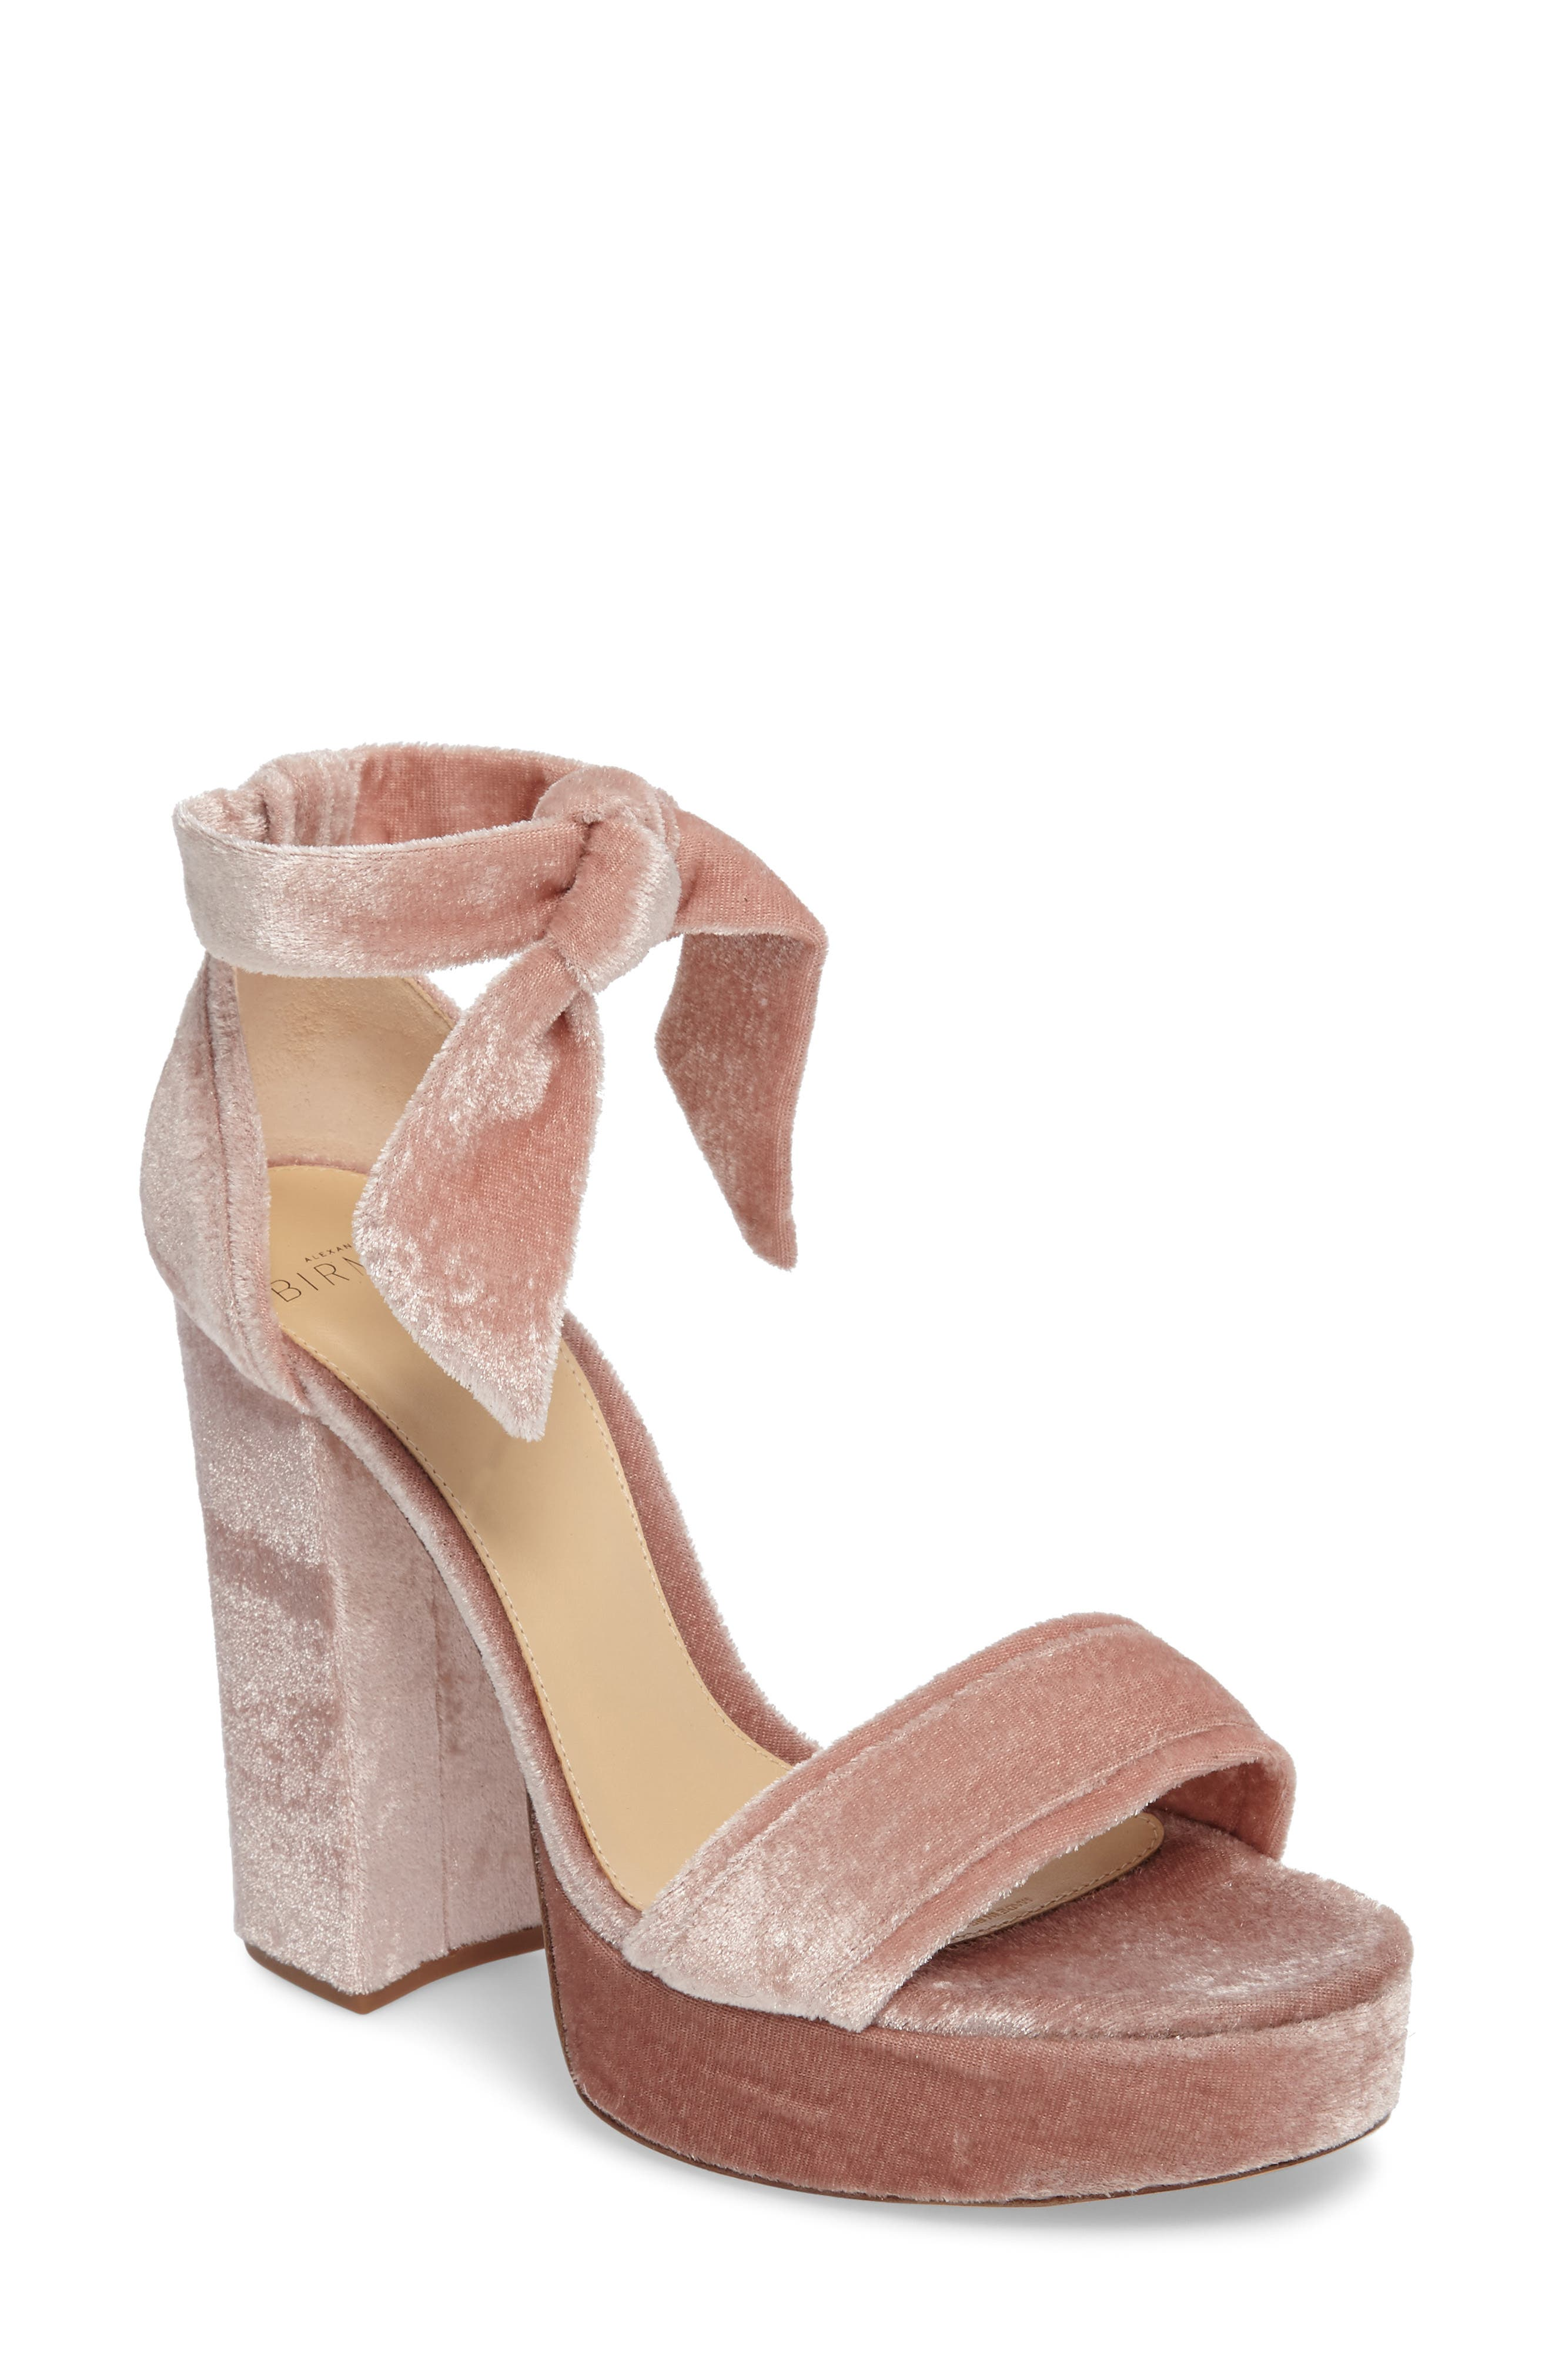 Main Image - Alexandre Birman Celine Platform Sandal (Women)